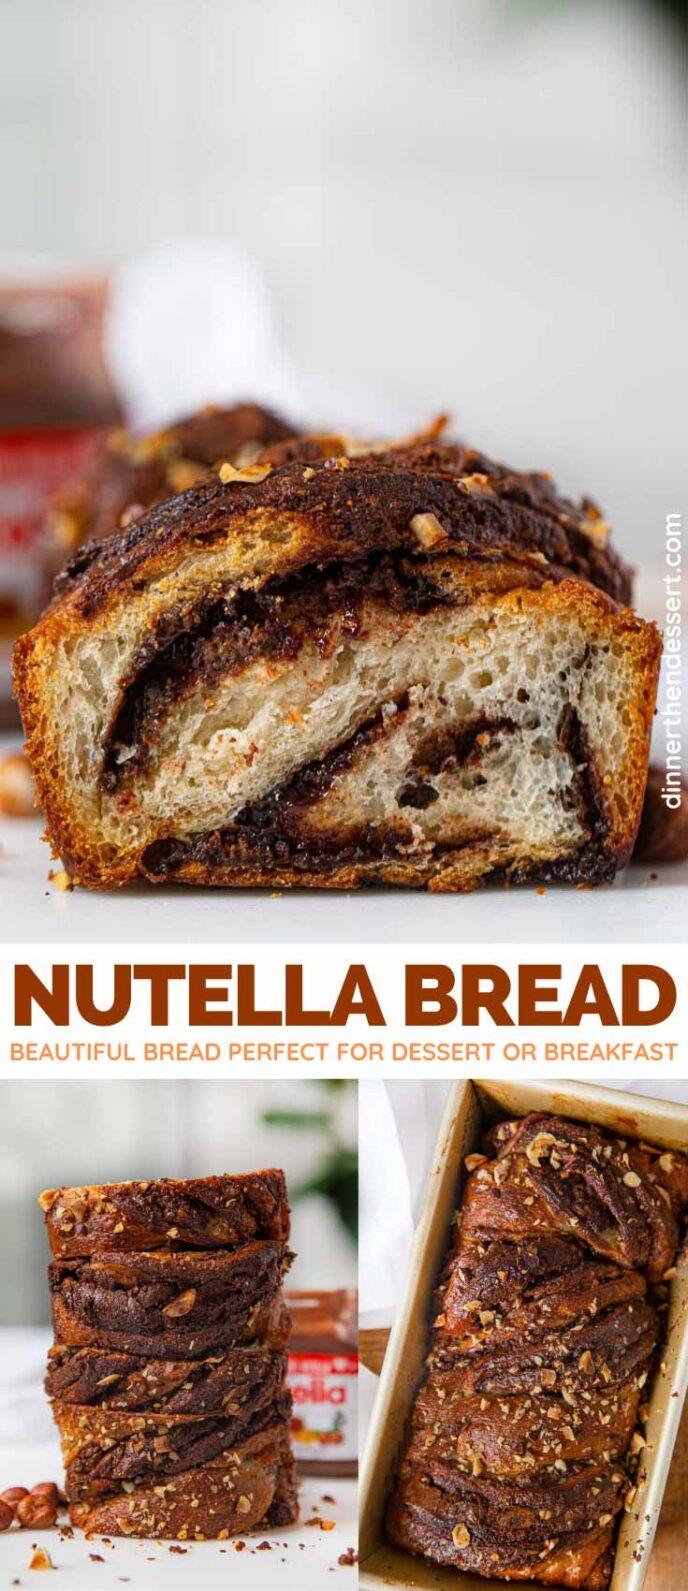 Homemade Nutella Bread collage